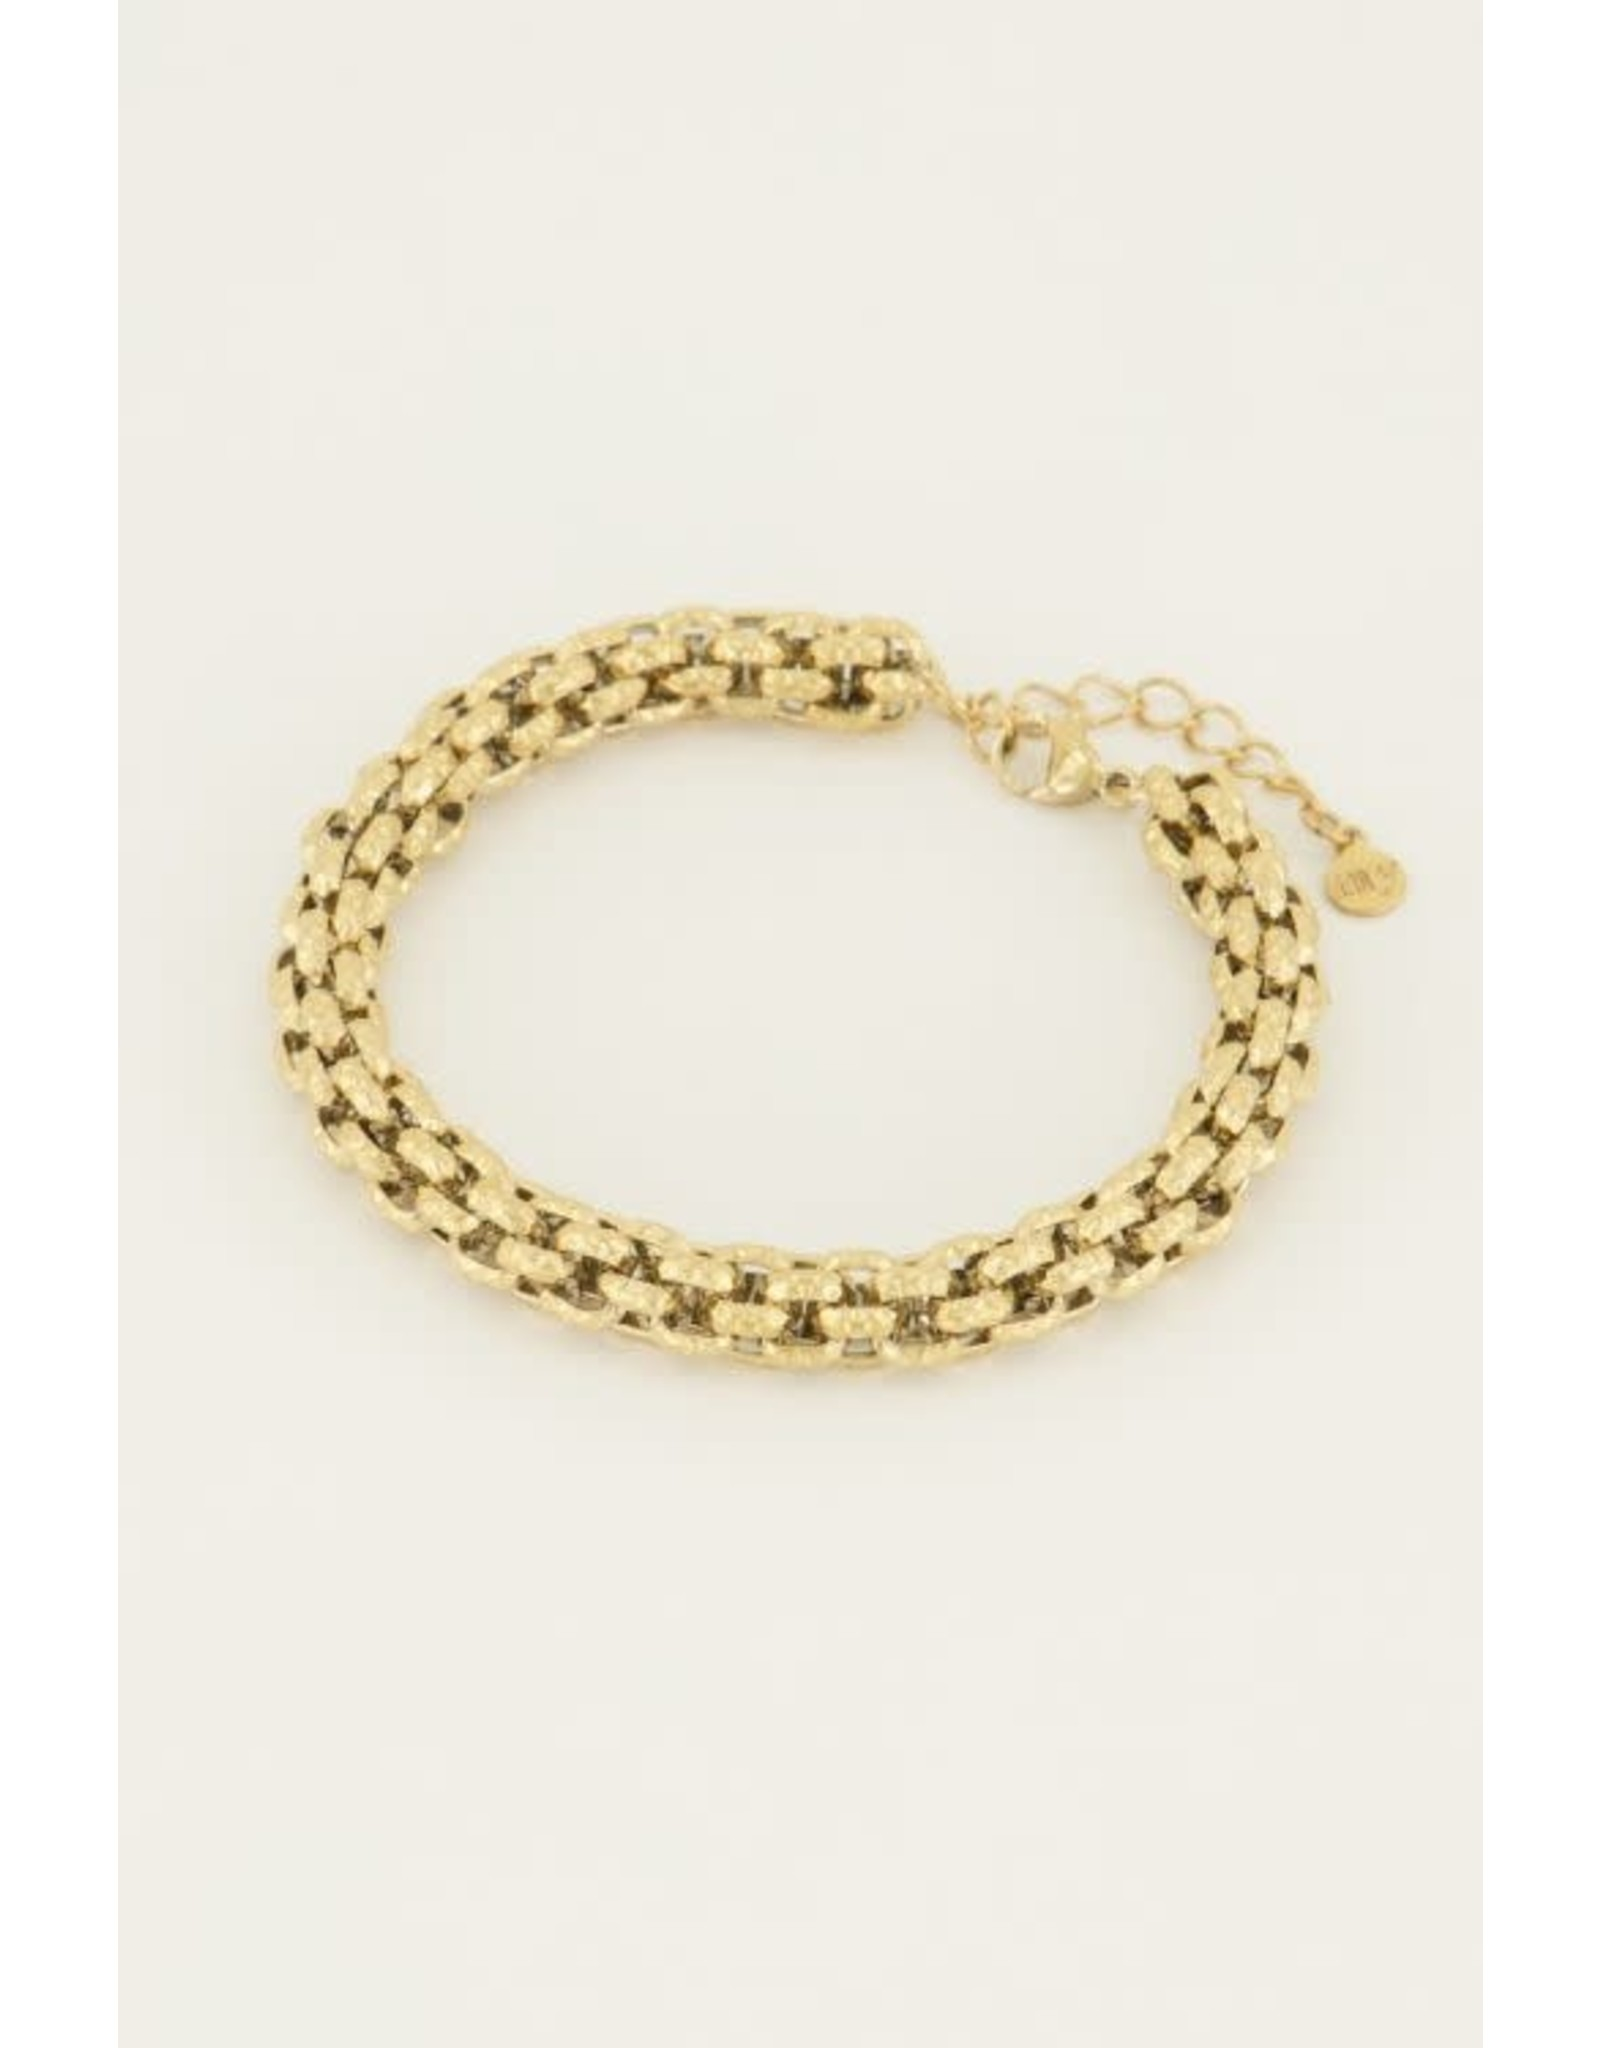 My Jewellery My Jewellery chunky armband schakels motief